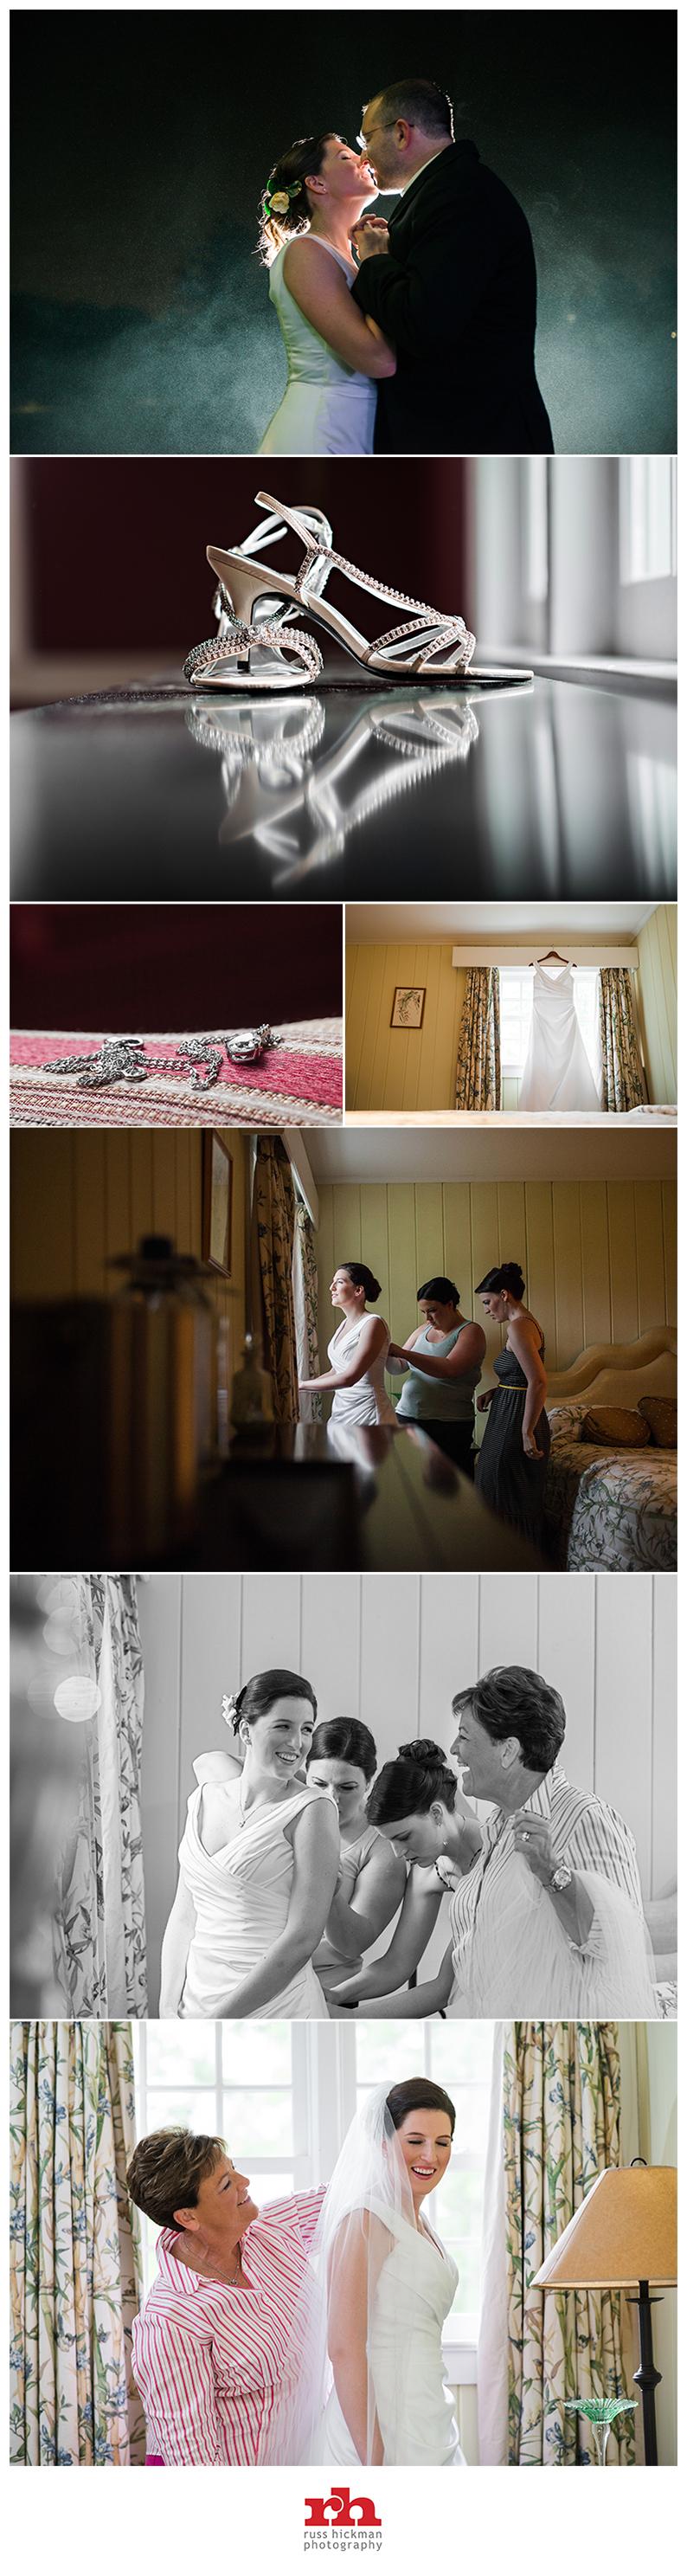 Philadelphia Wedding Photographer MZWB0001